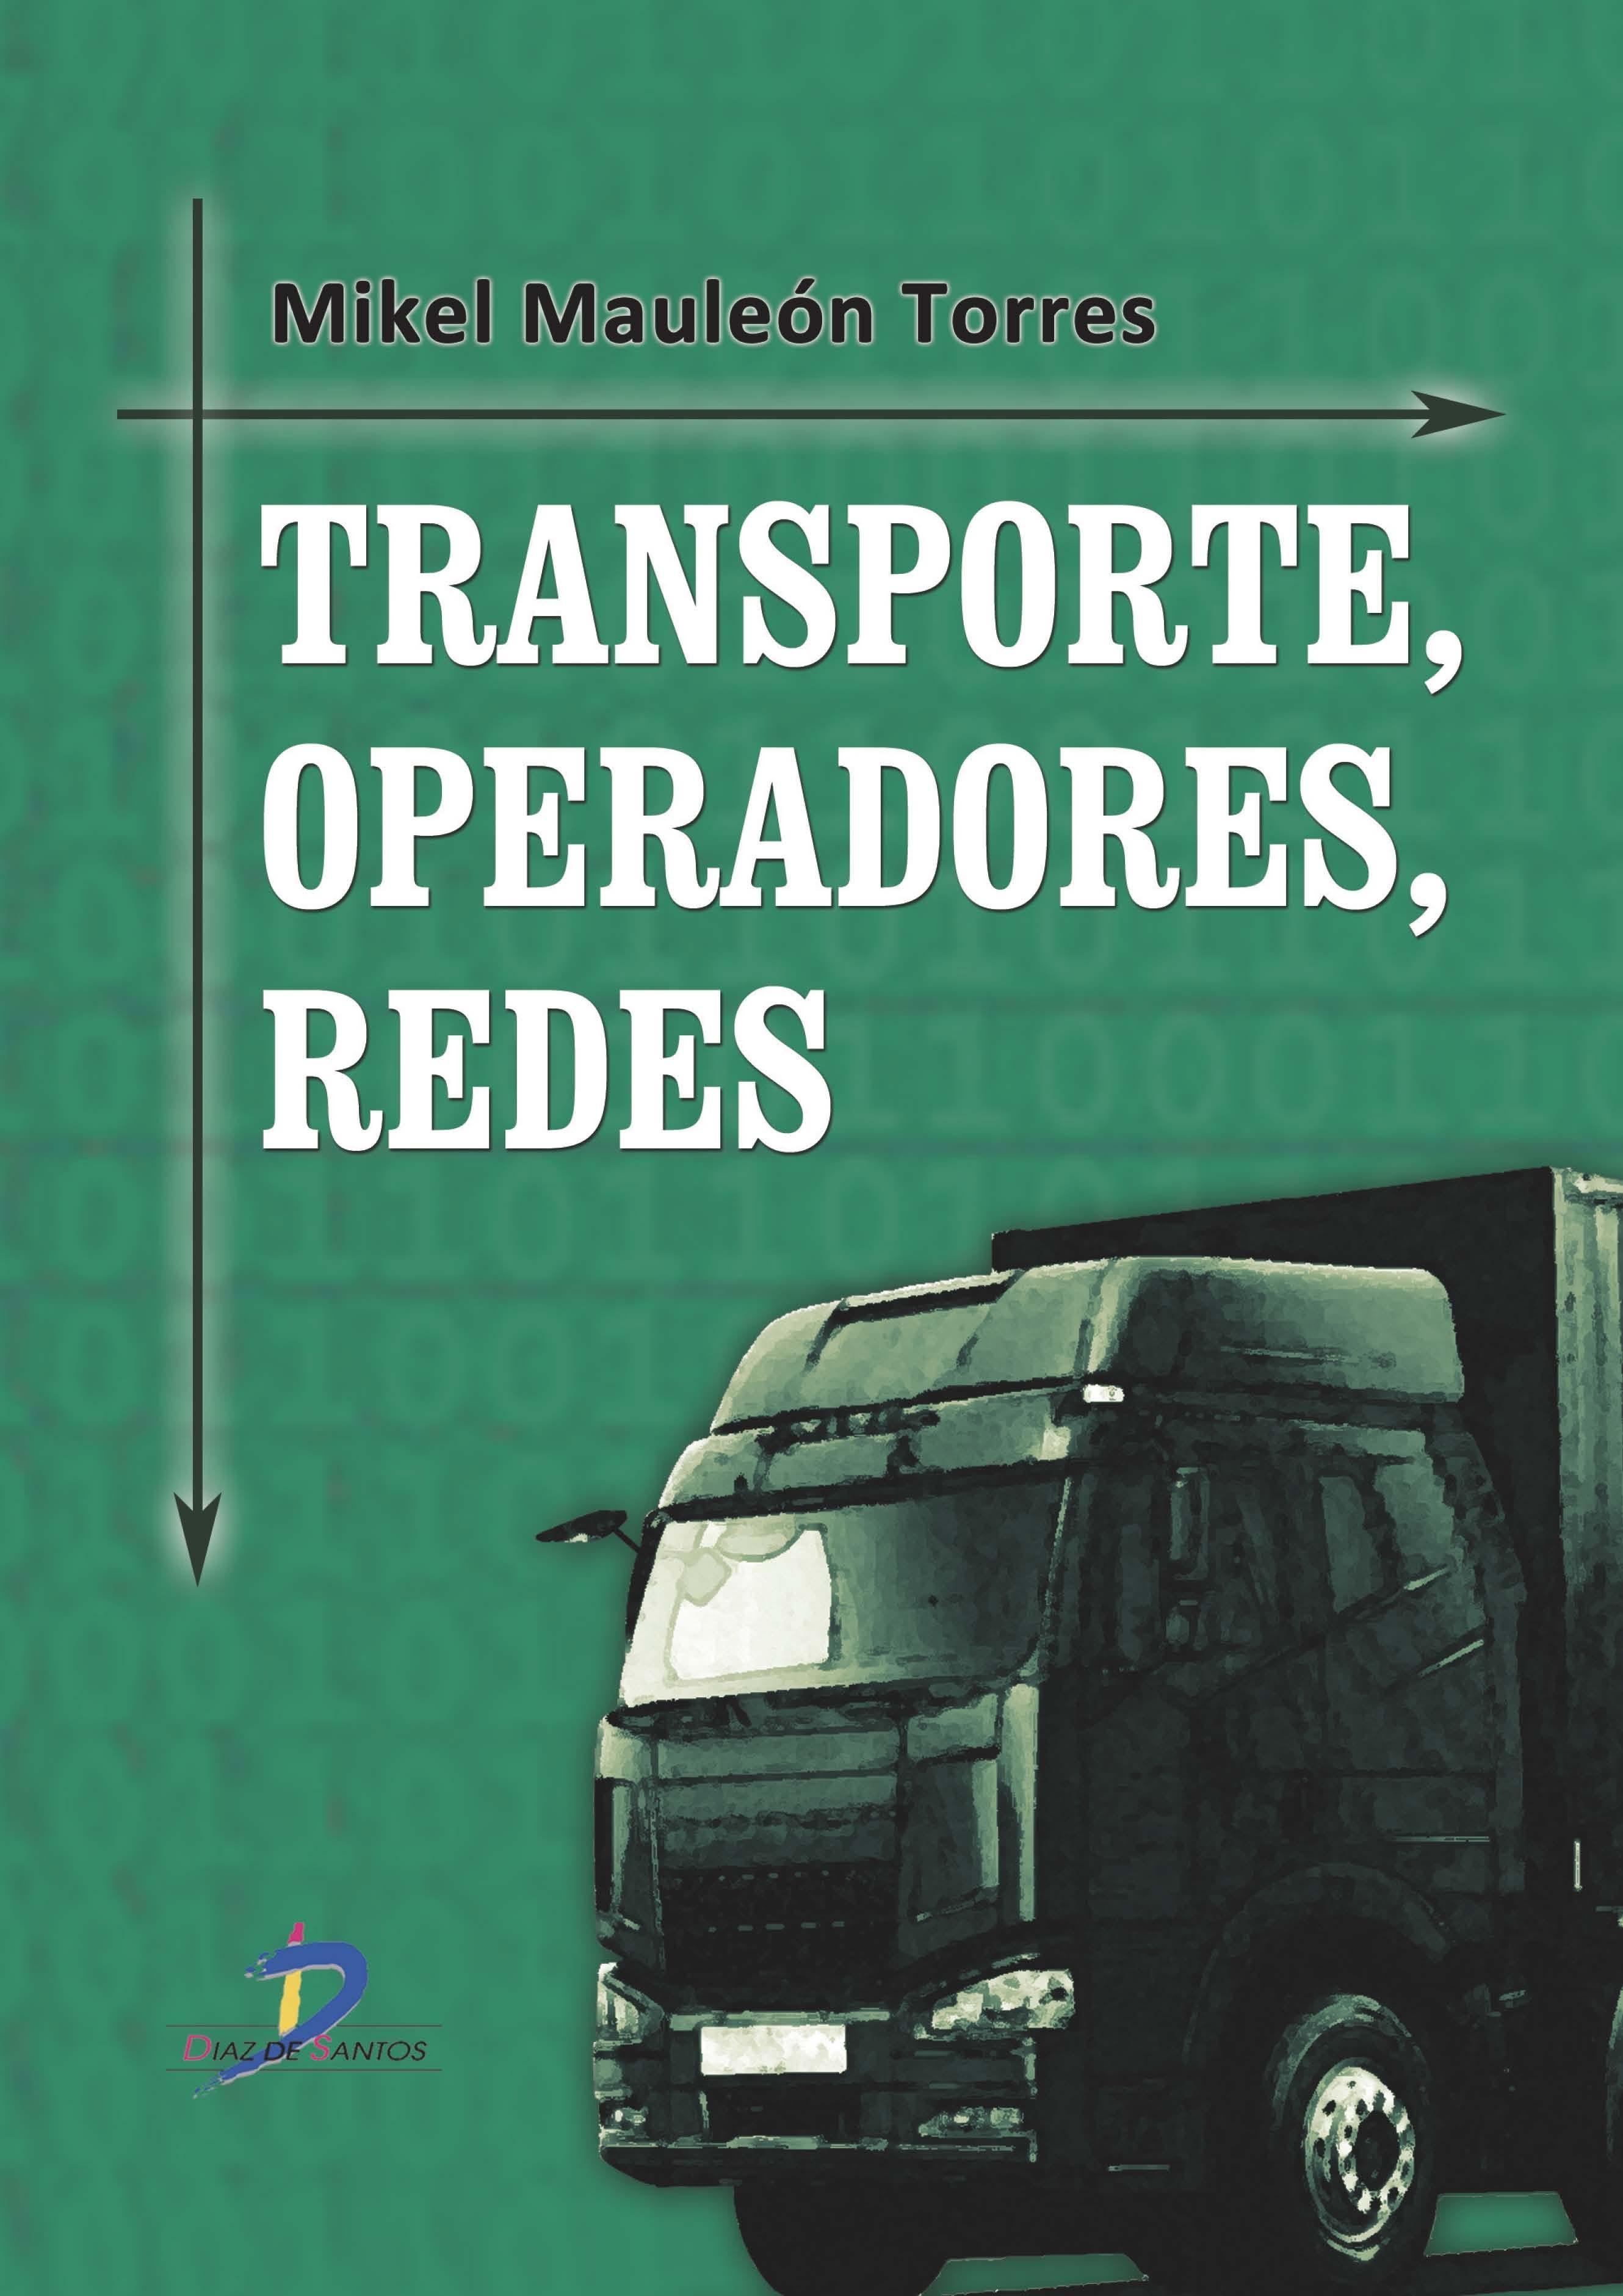 Transporte, operadores, redes; mikel mauleón torres